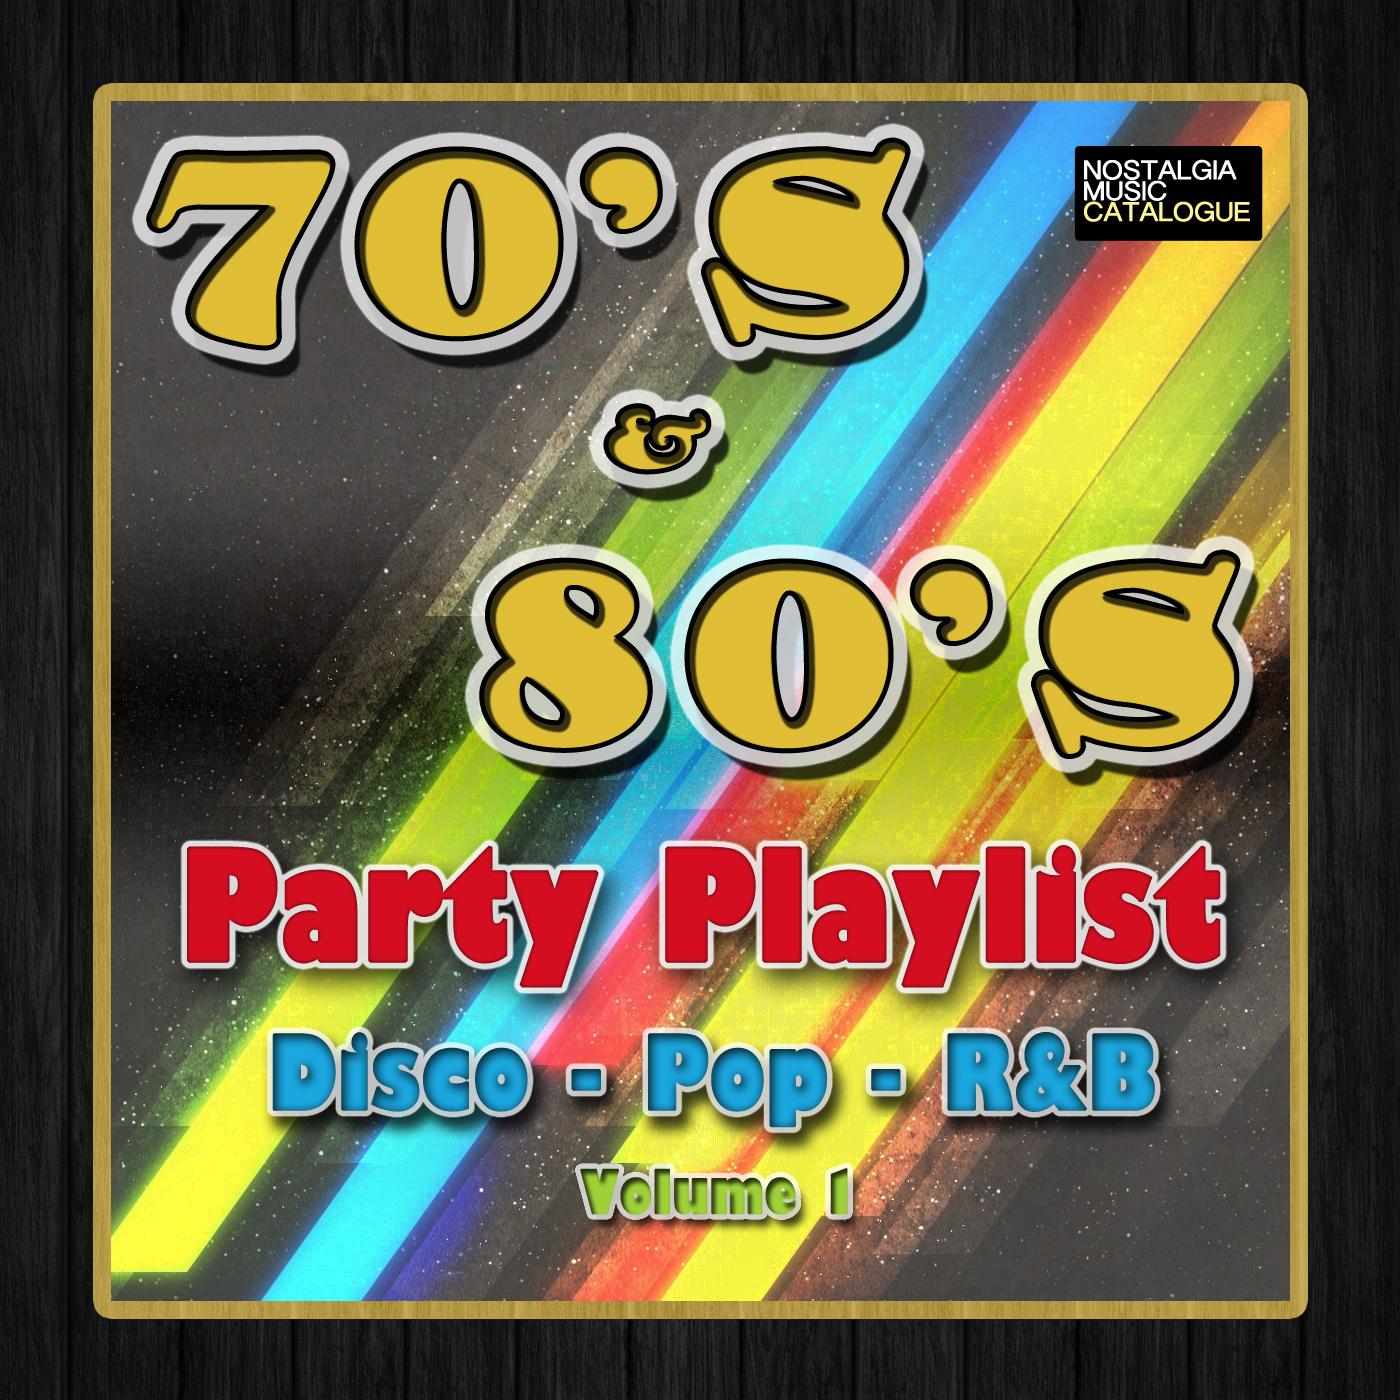 70's & 80's Party Playlist - Volume 1 (Disco - Pop - R&B